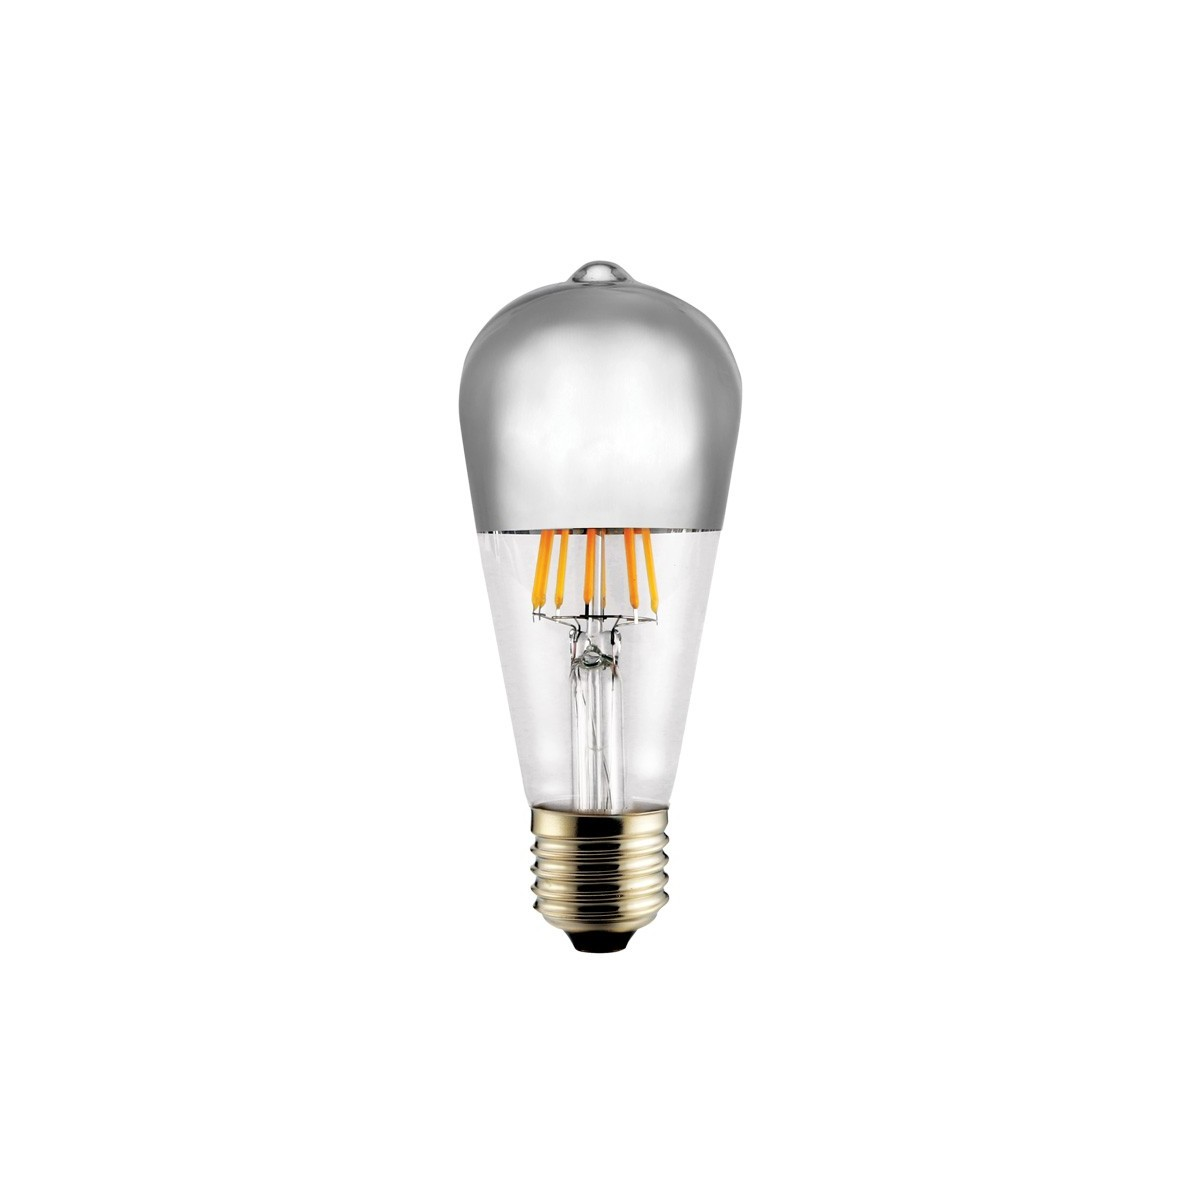 Bombilla LED E27 ST64 Half Mirror G95 plata 8w